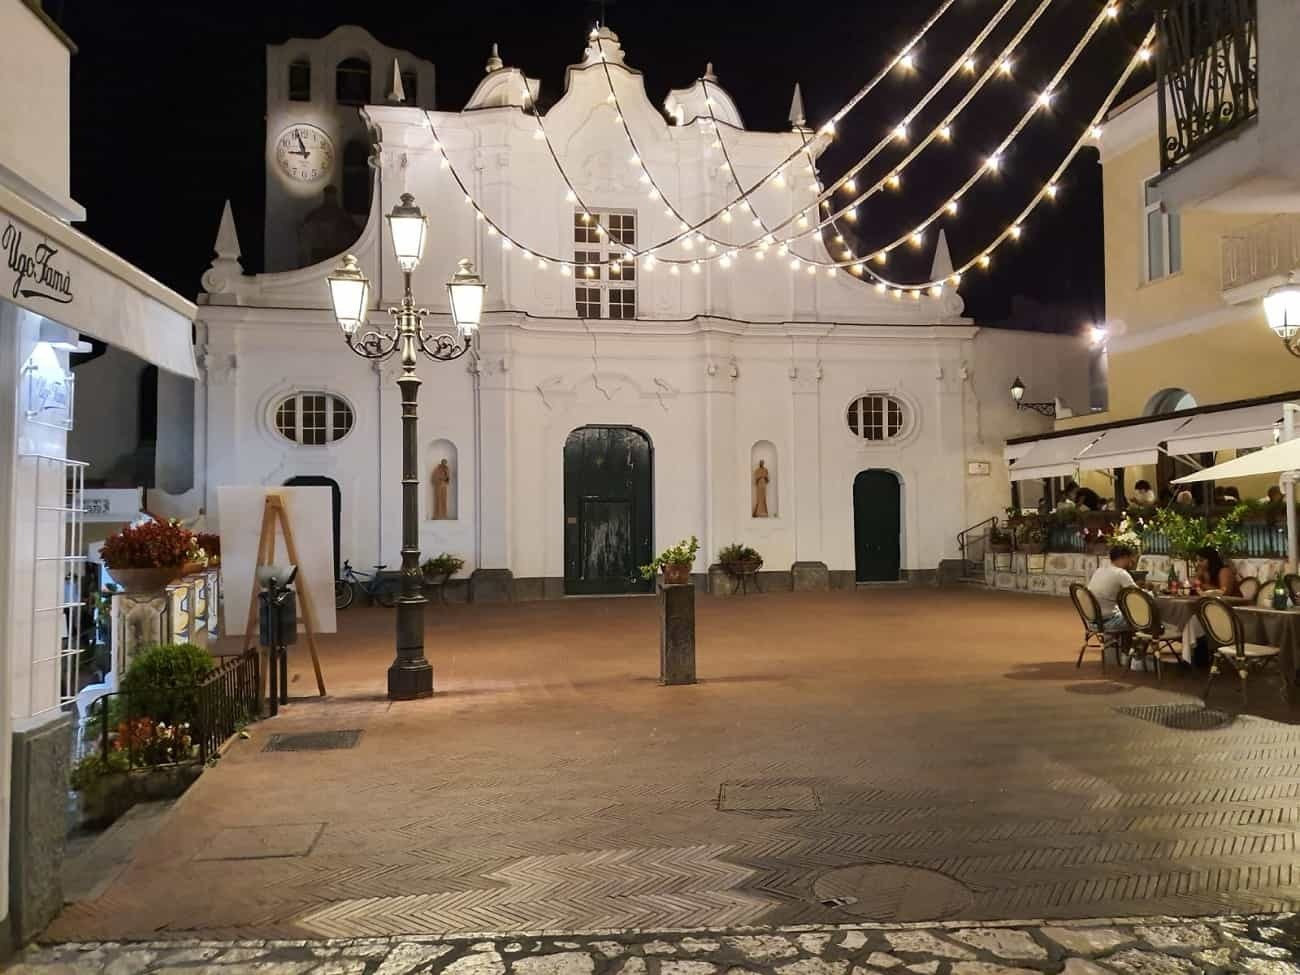 San Michele church at night